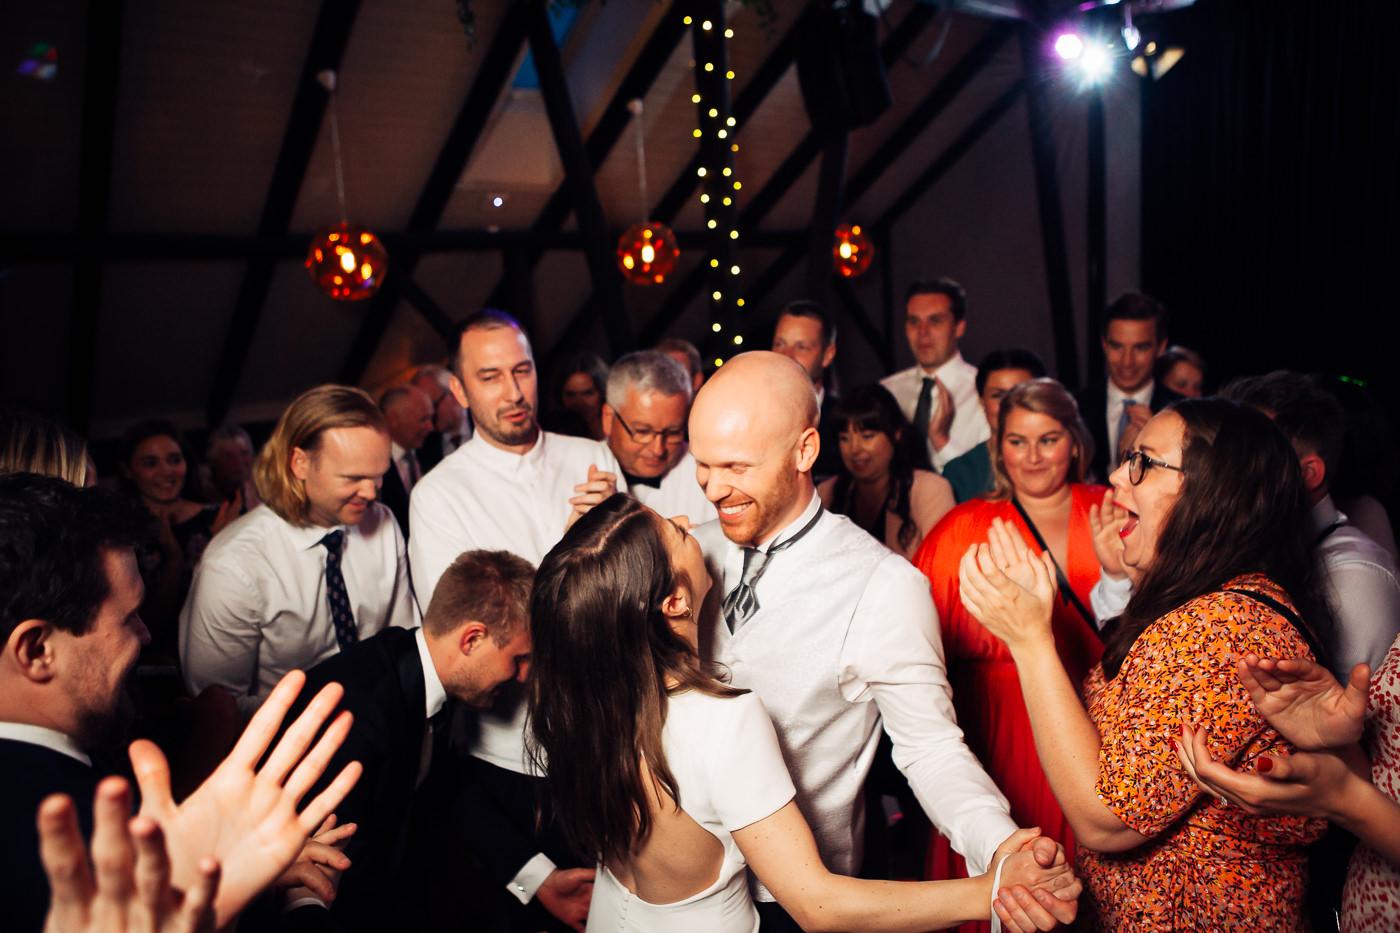 Malene & Ole Martin - elegant dansk- norskt bryllup i Oslo Bryllup Gamle Aker Oslo 10 Akershus